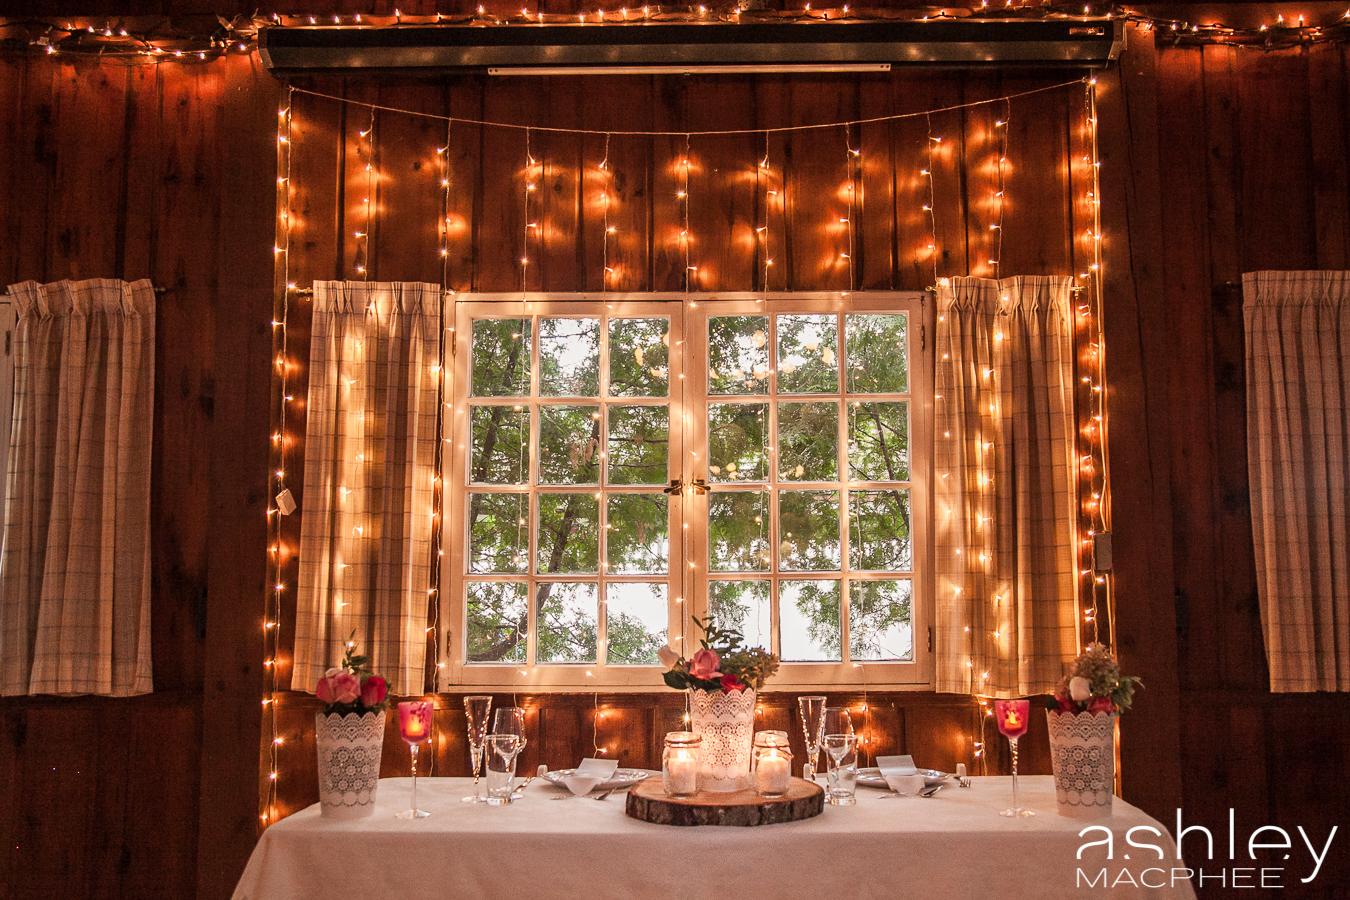 Ashley MacPhee Photography Hudson Yacht Club wedding photographer (62 of 112).jpg